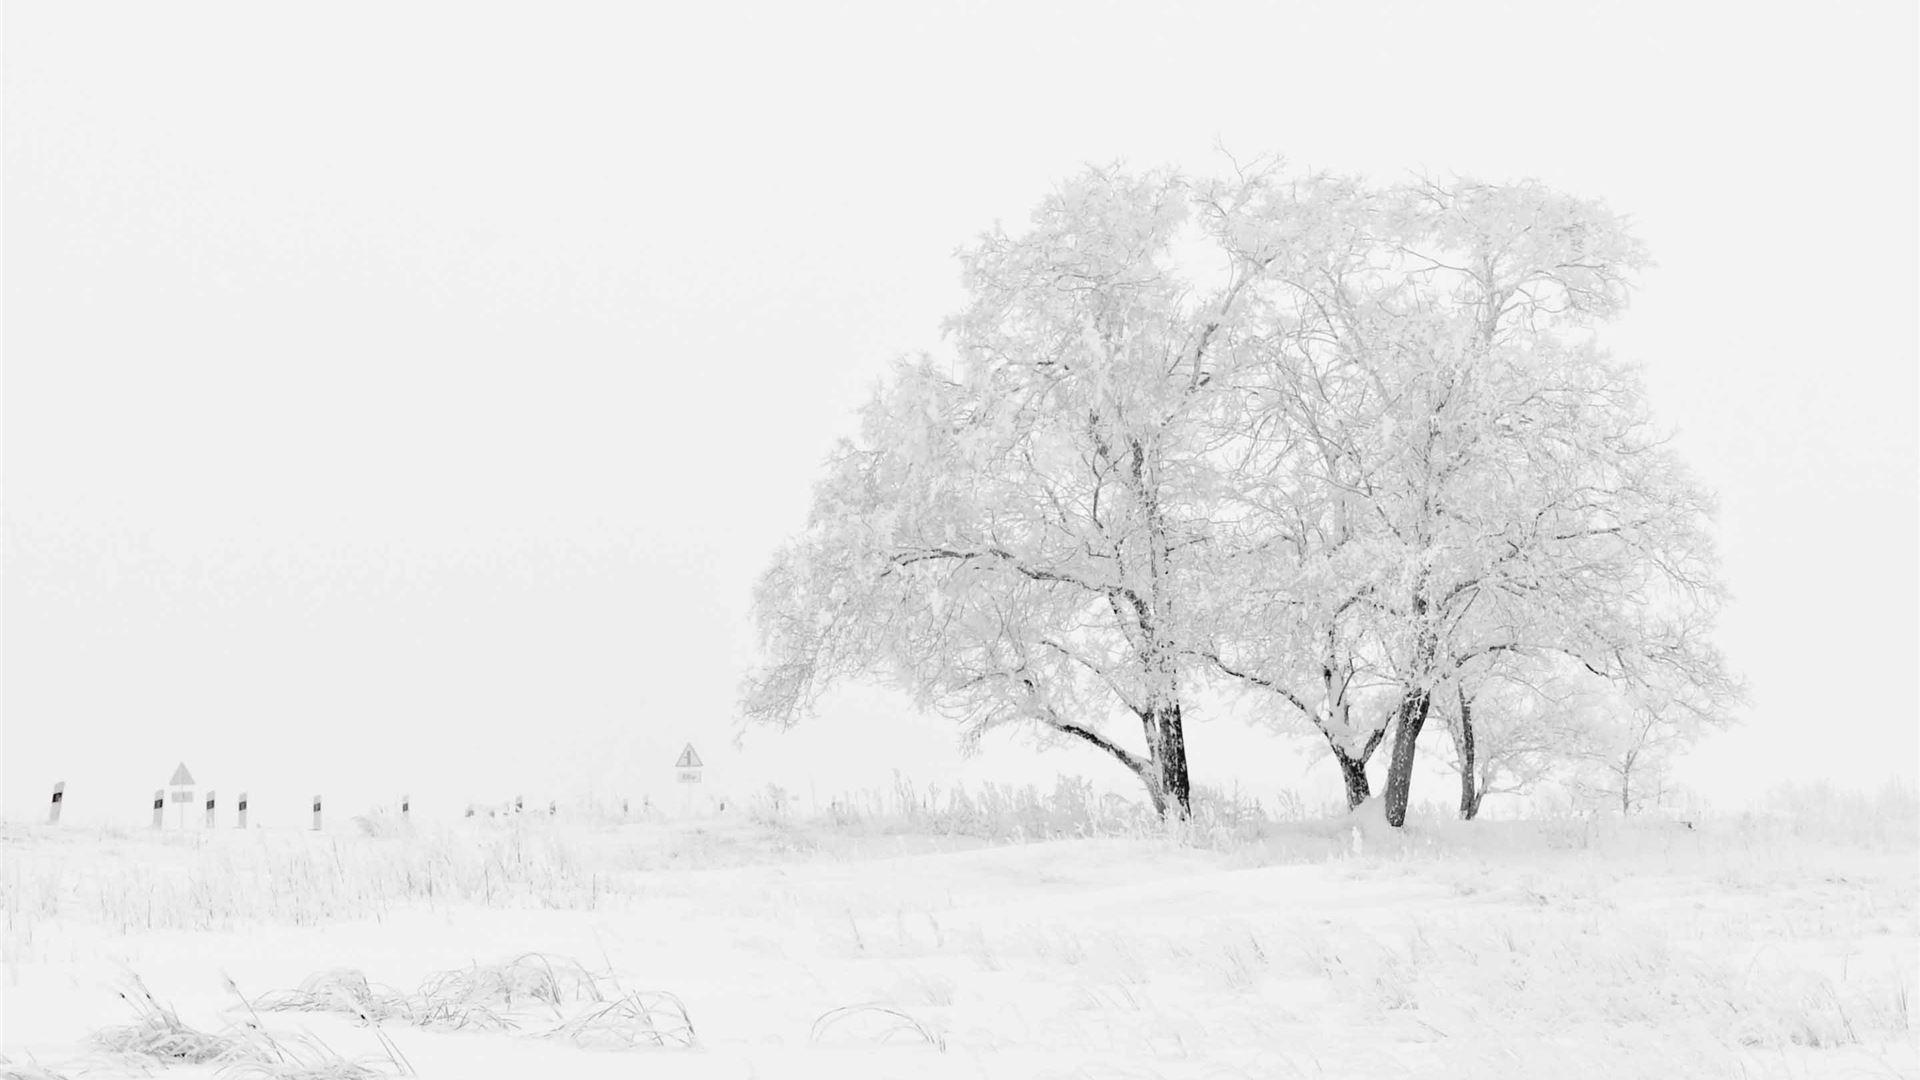 White-Winter-1920x1080.jpg